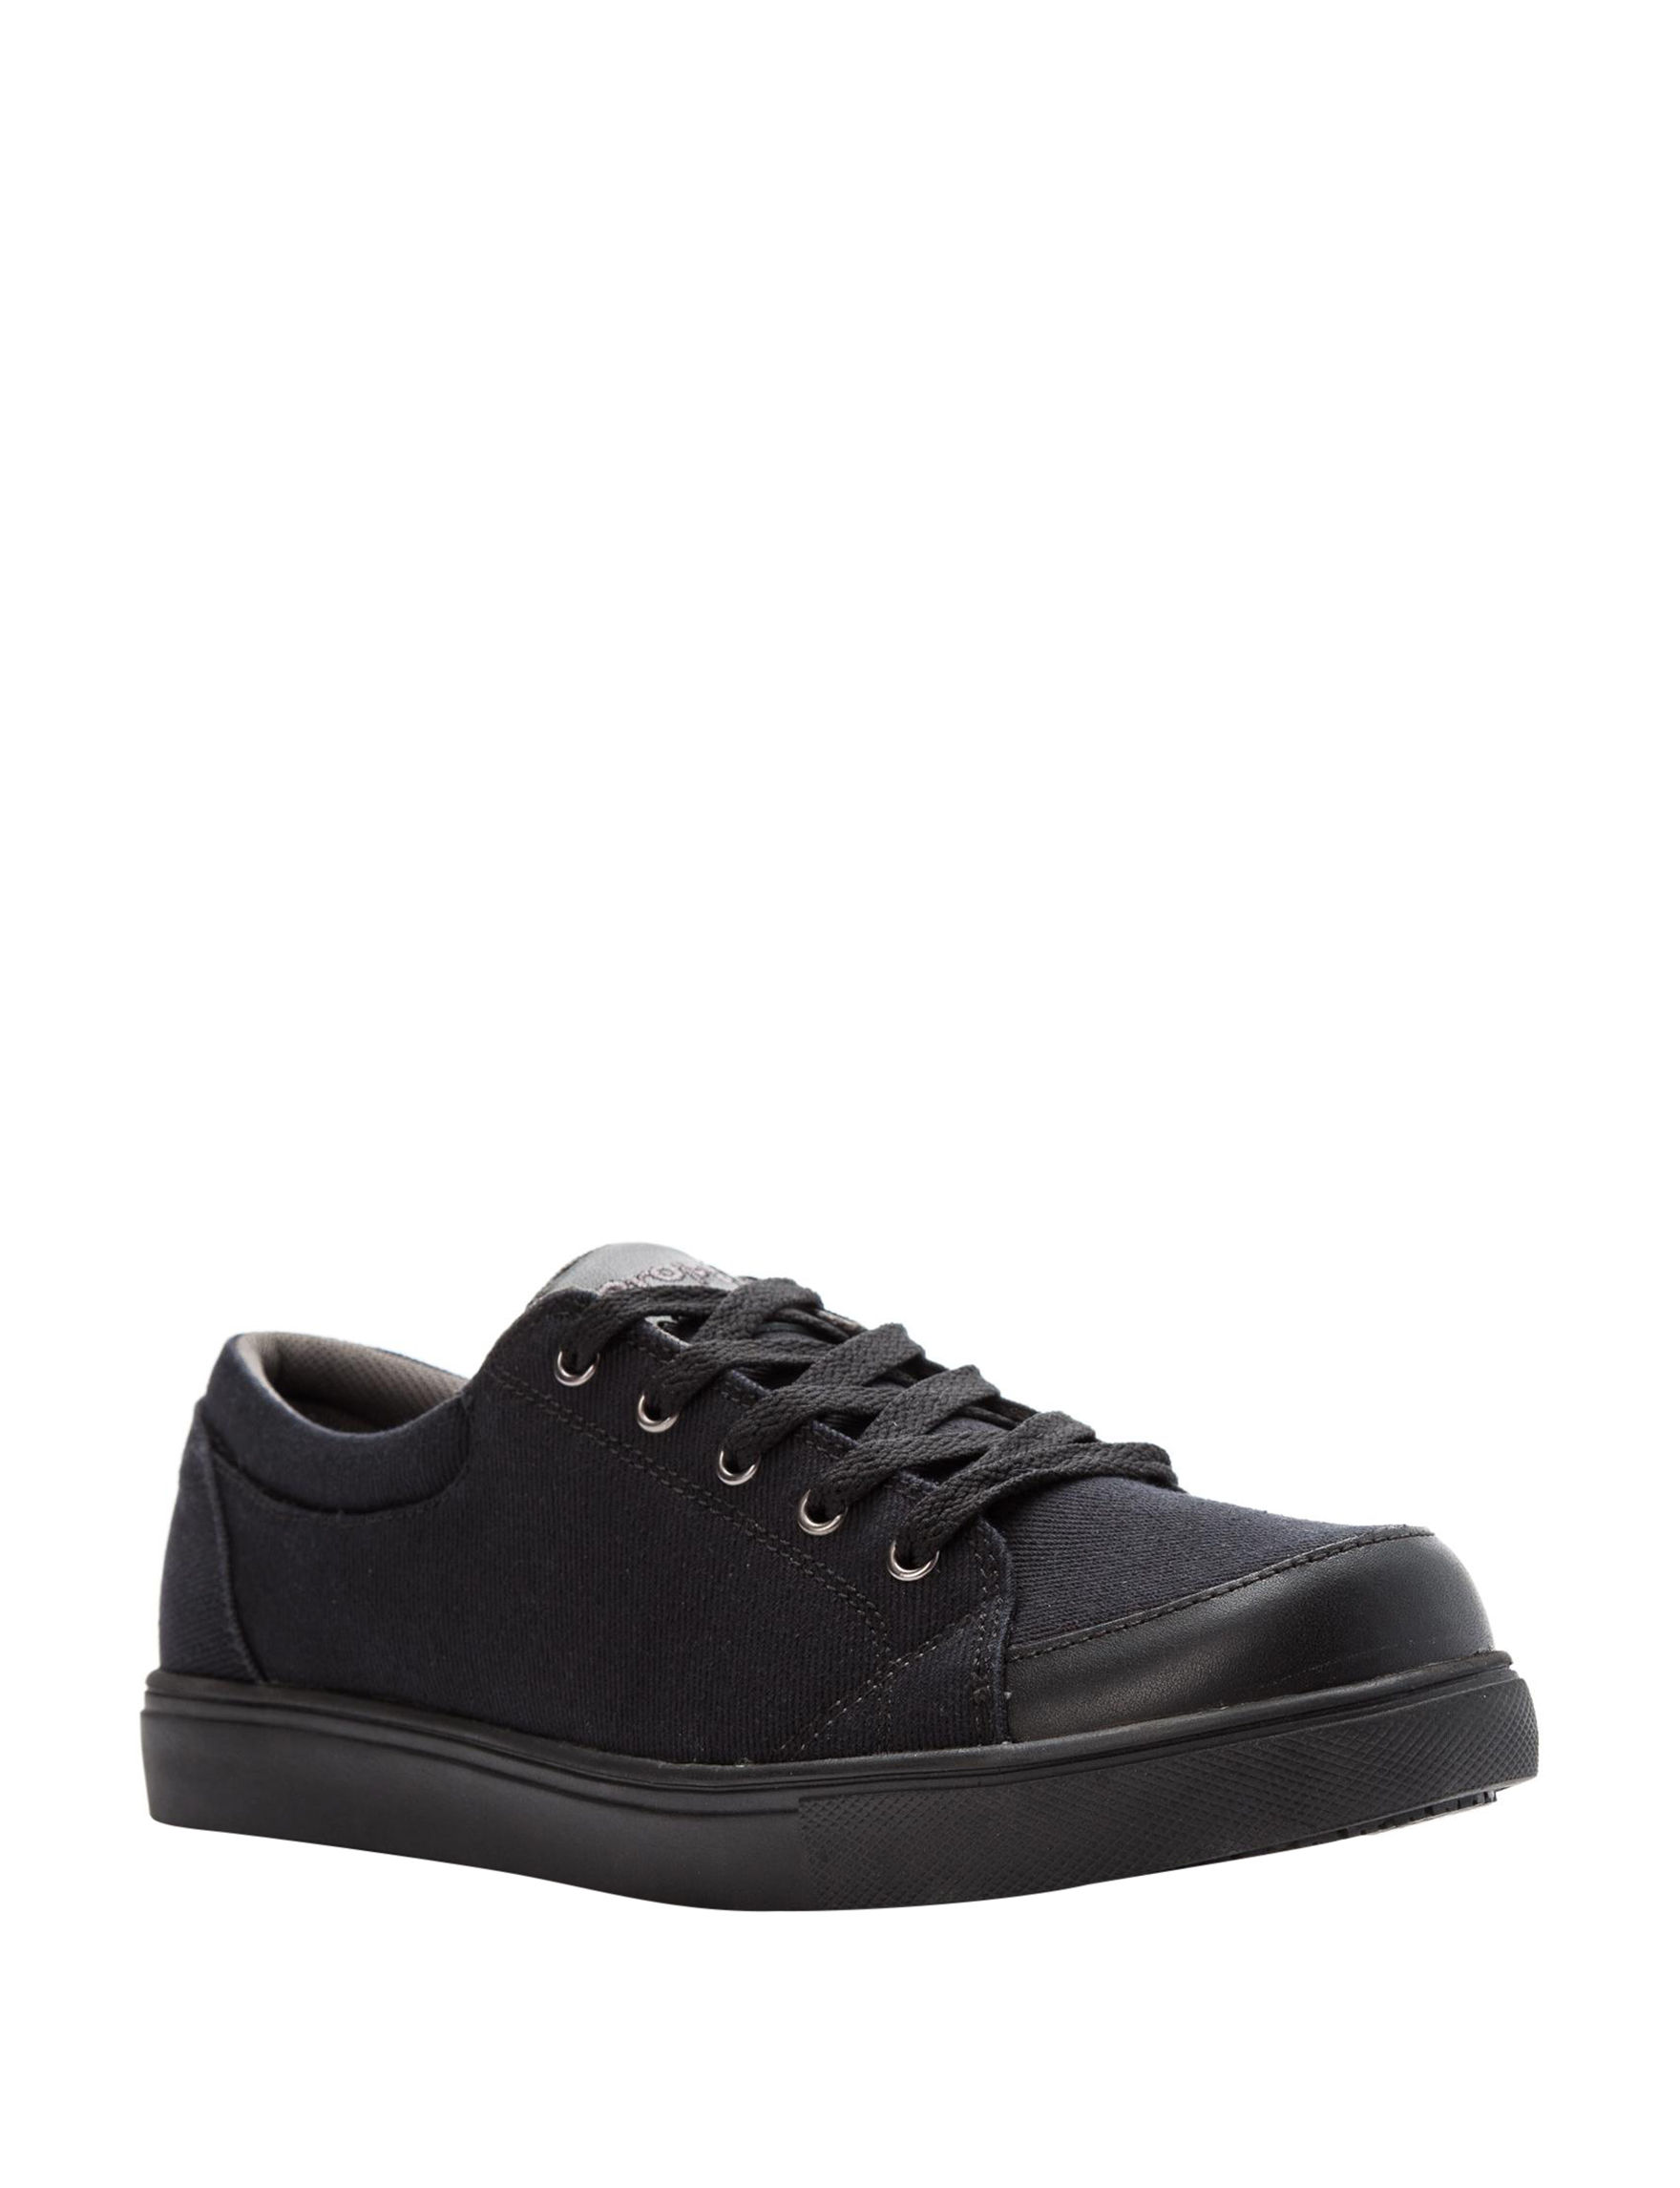 Propet Black Slip Resistant